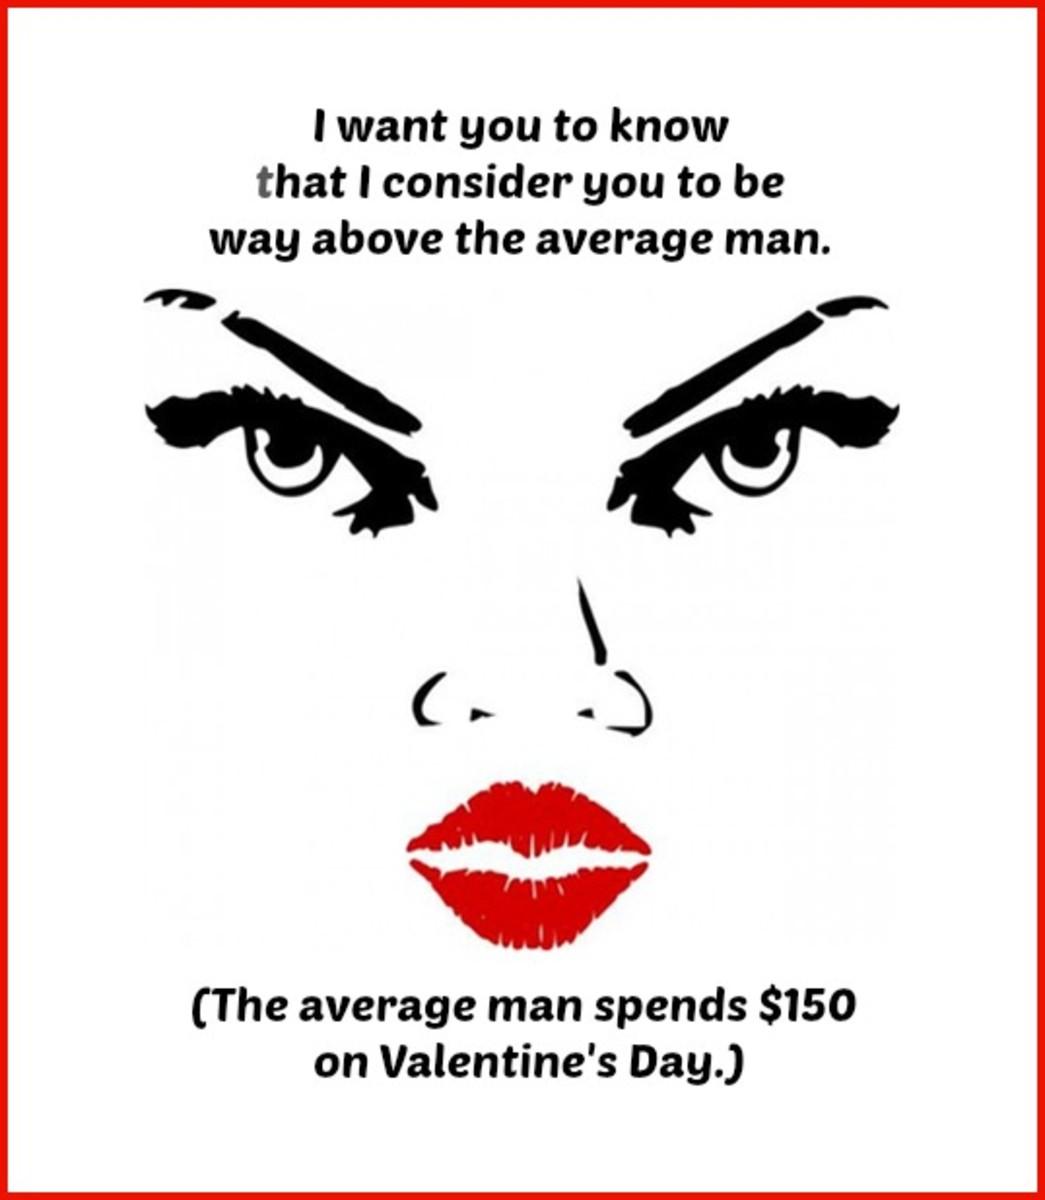 Intimidating Valentine's Day Card